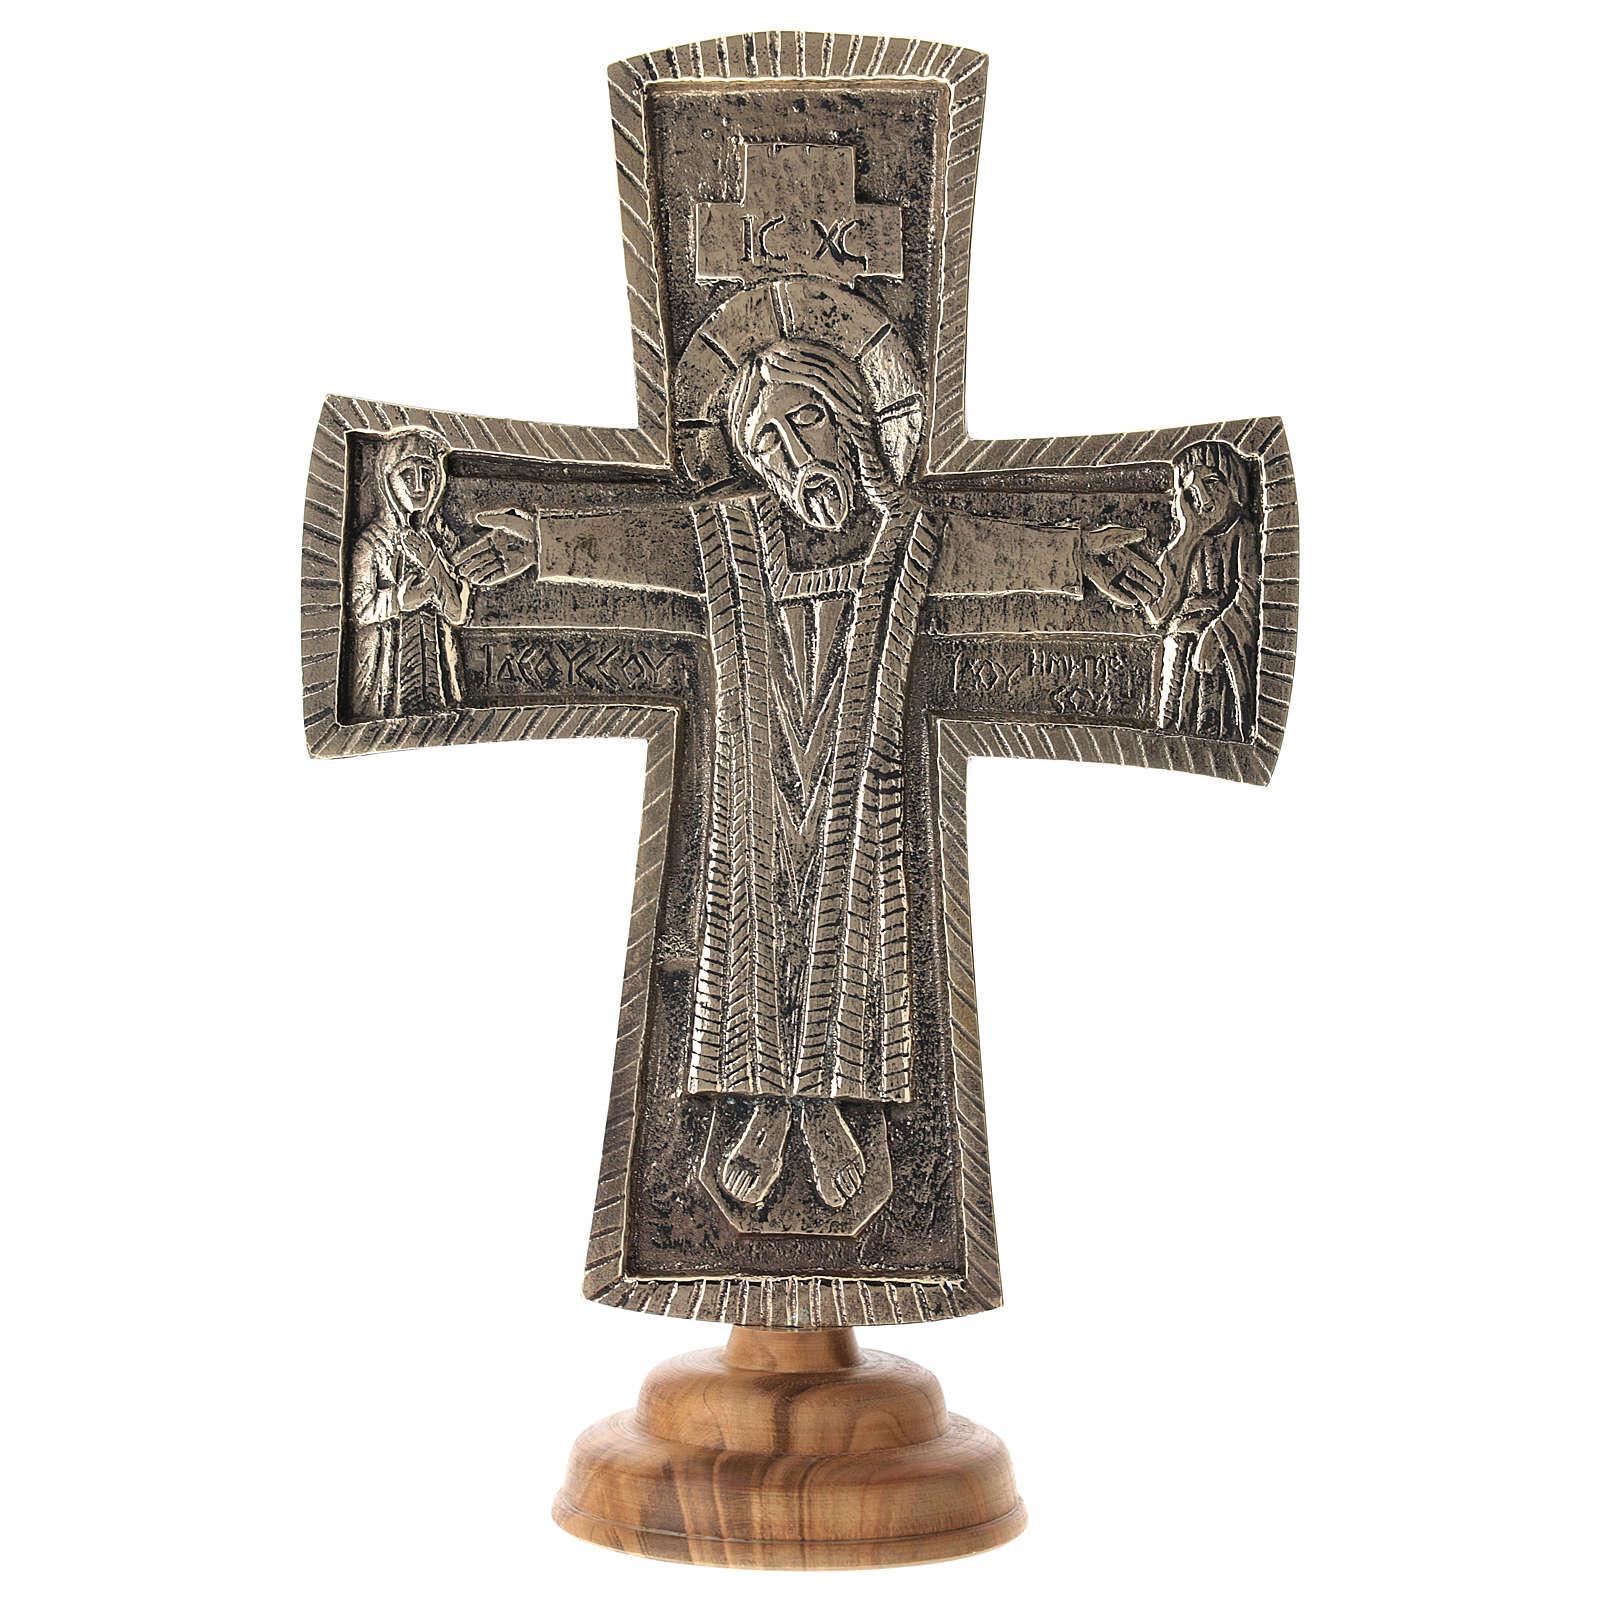 Crocefisso da altare Monaci di Betlemme Jésus Grand Prêtre ottone 30x20 4